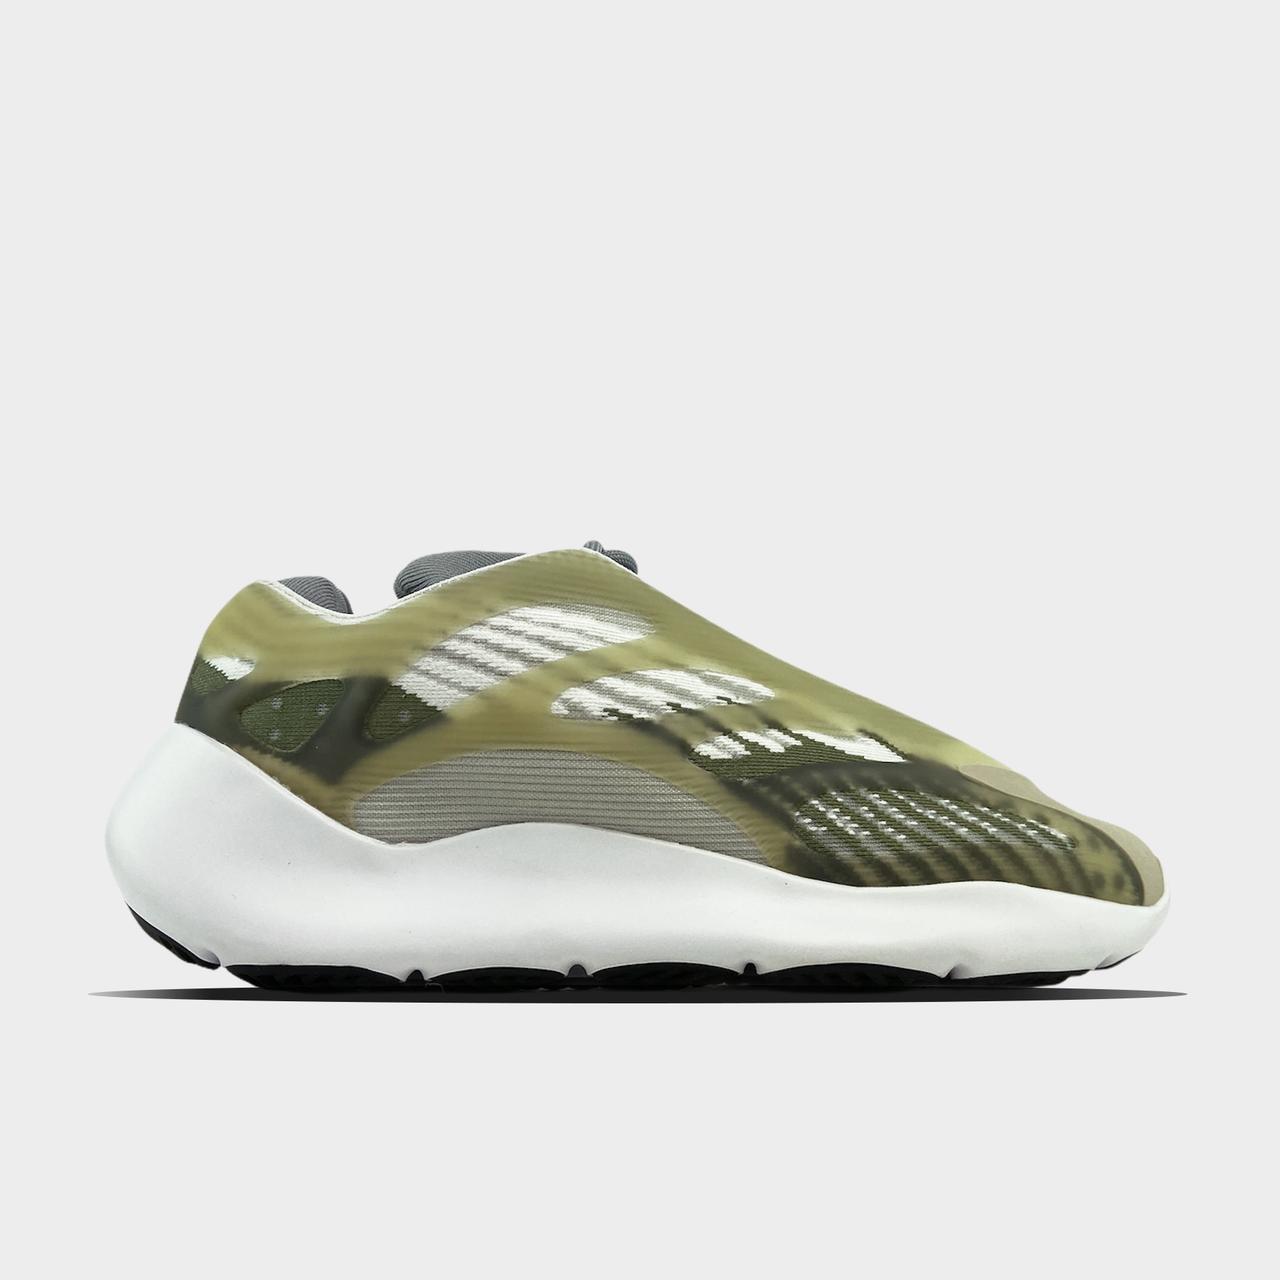 Adidas Yeezy Boost 700 V3 Green White (Зелений)